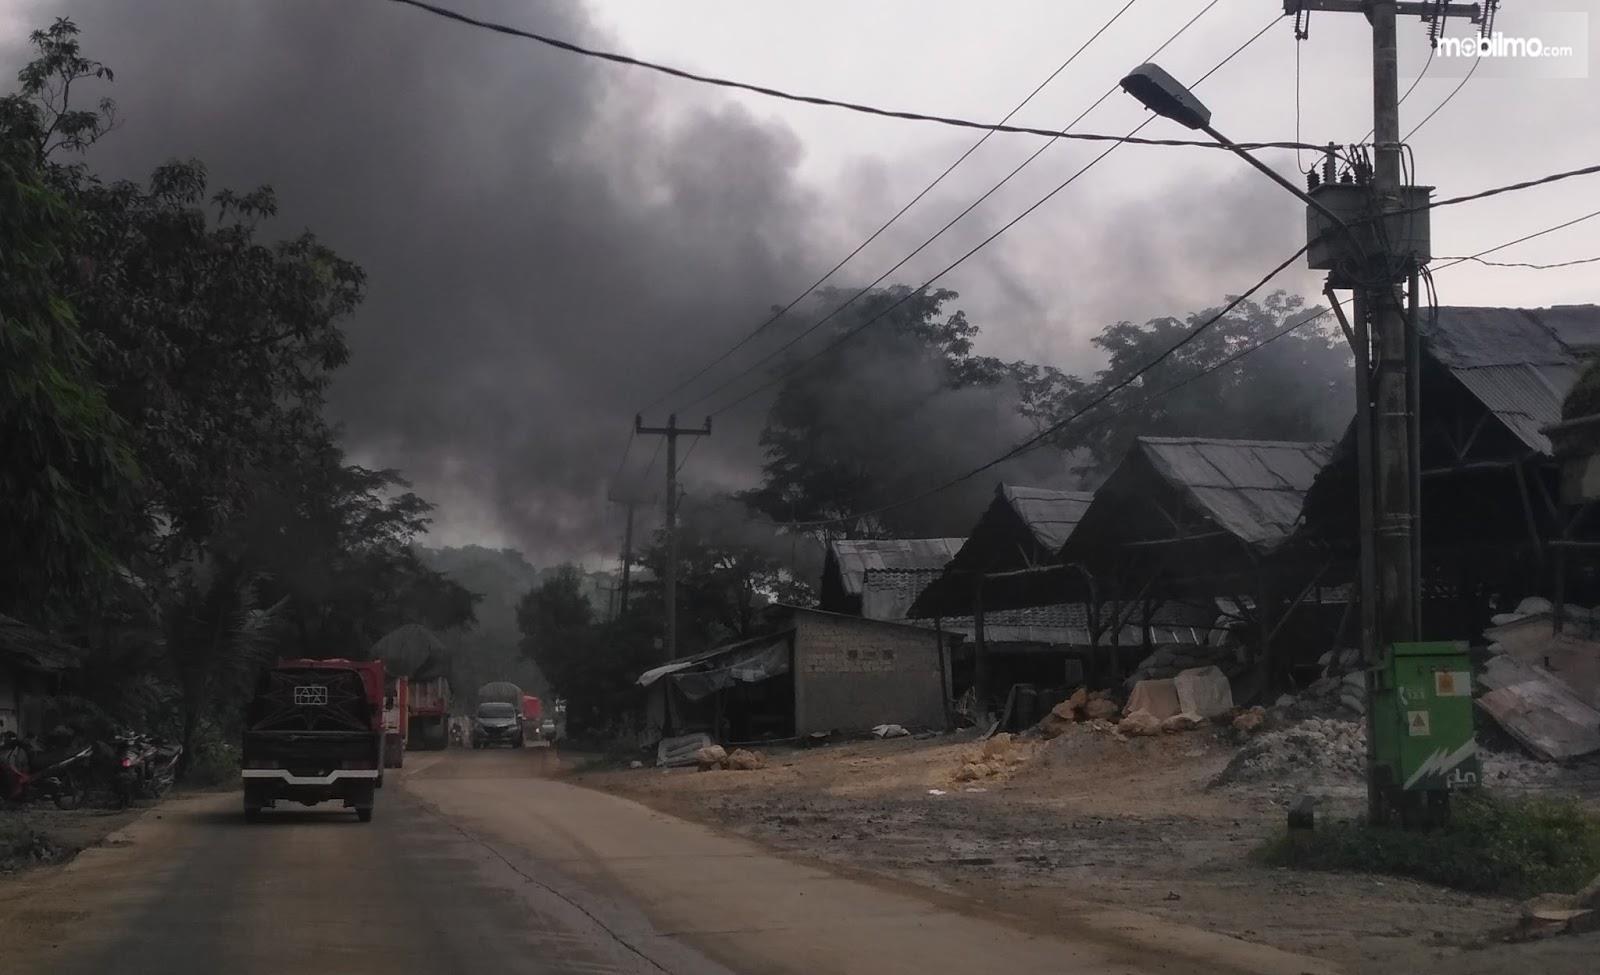 Proses pembakaran di pabrik kapur hasilkan asap pekat